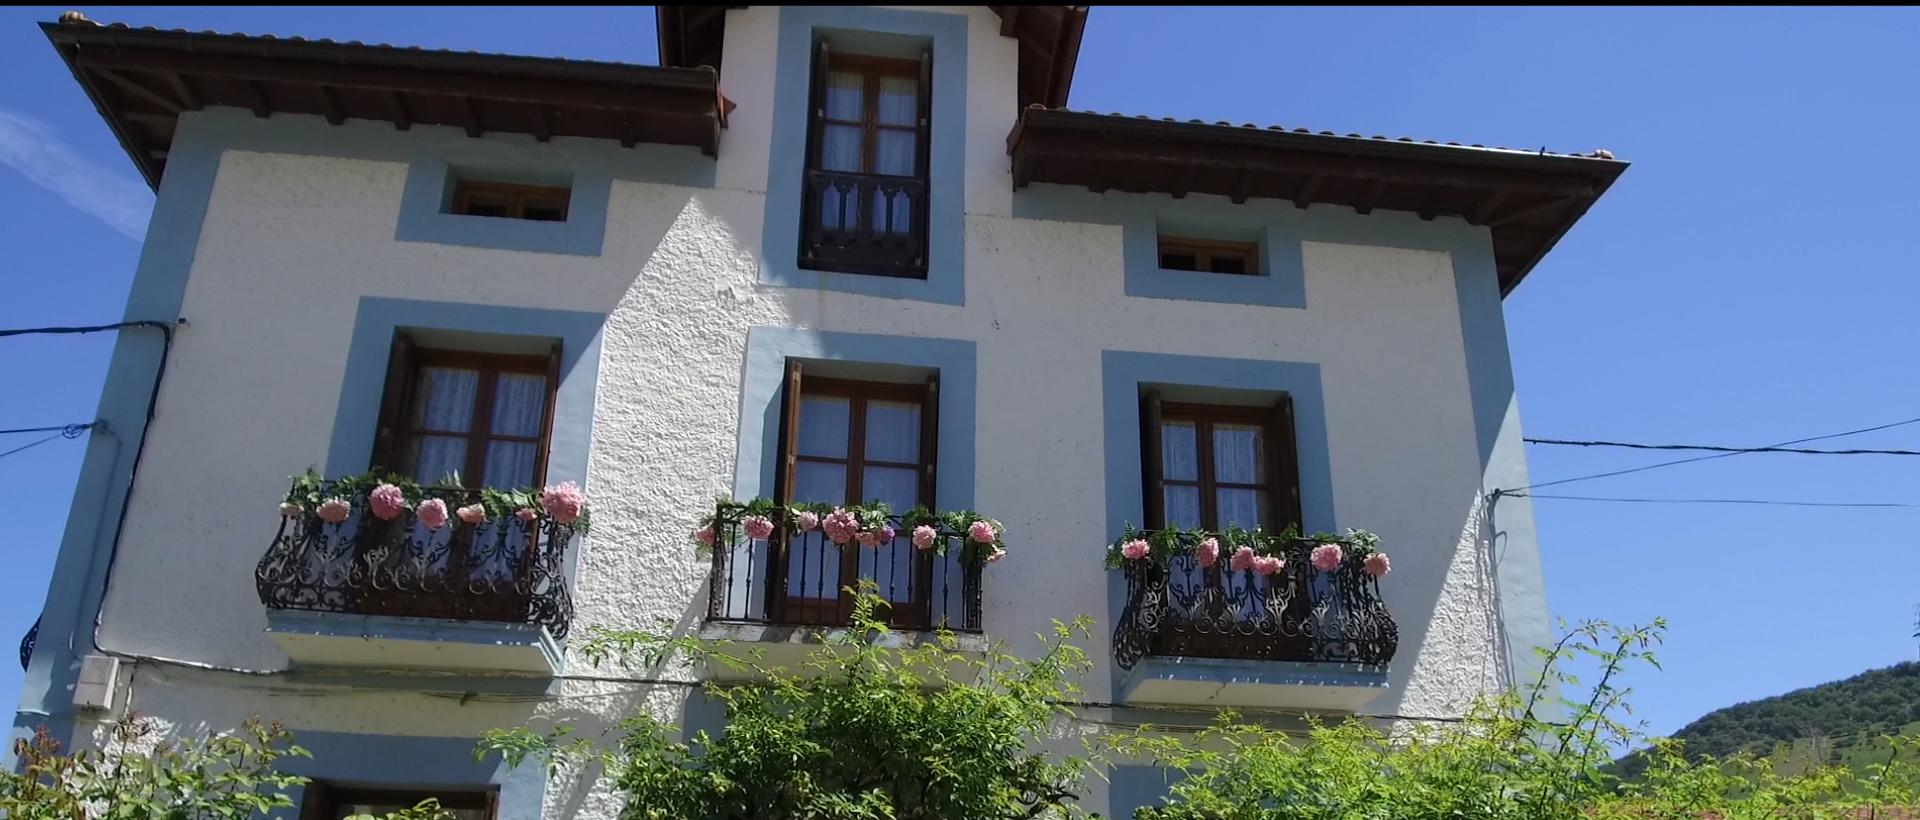 Villa argentina casa rural en beintza labaien navarra for Villas en argentina